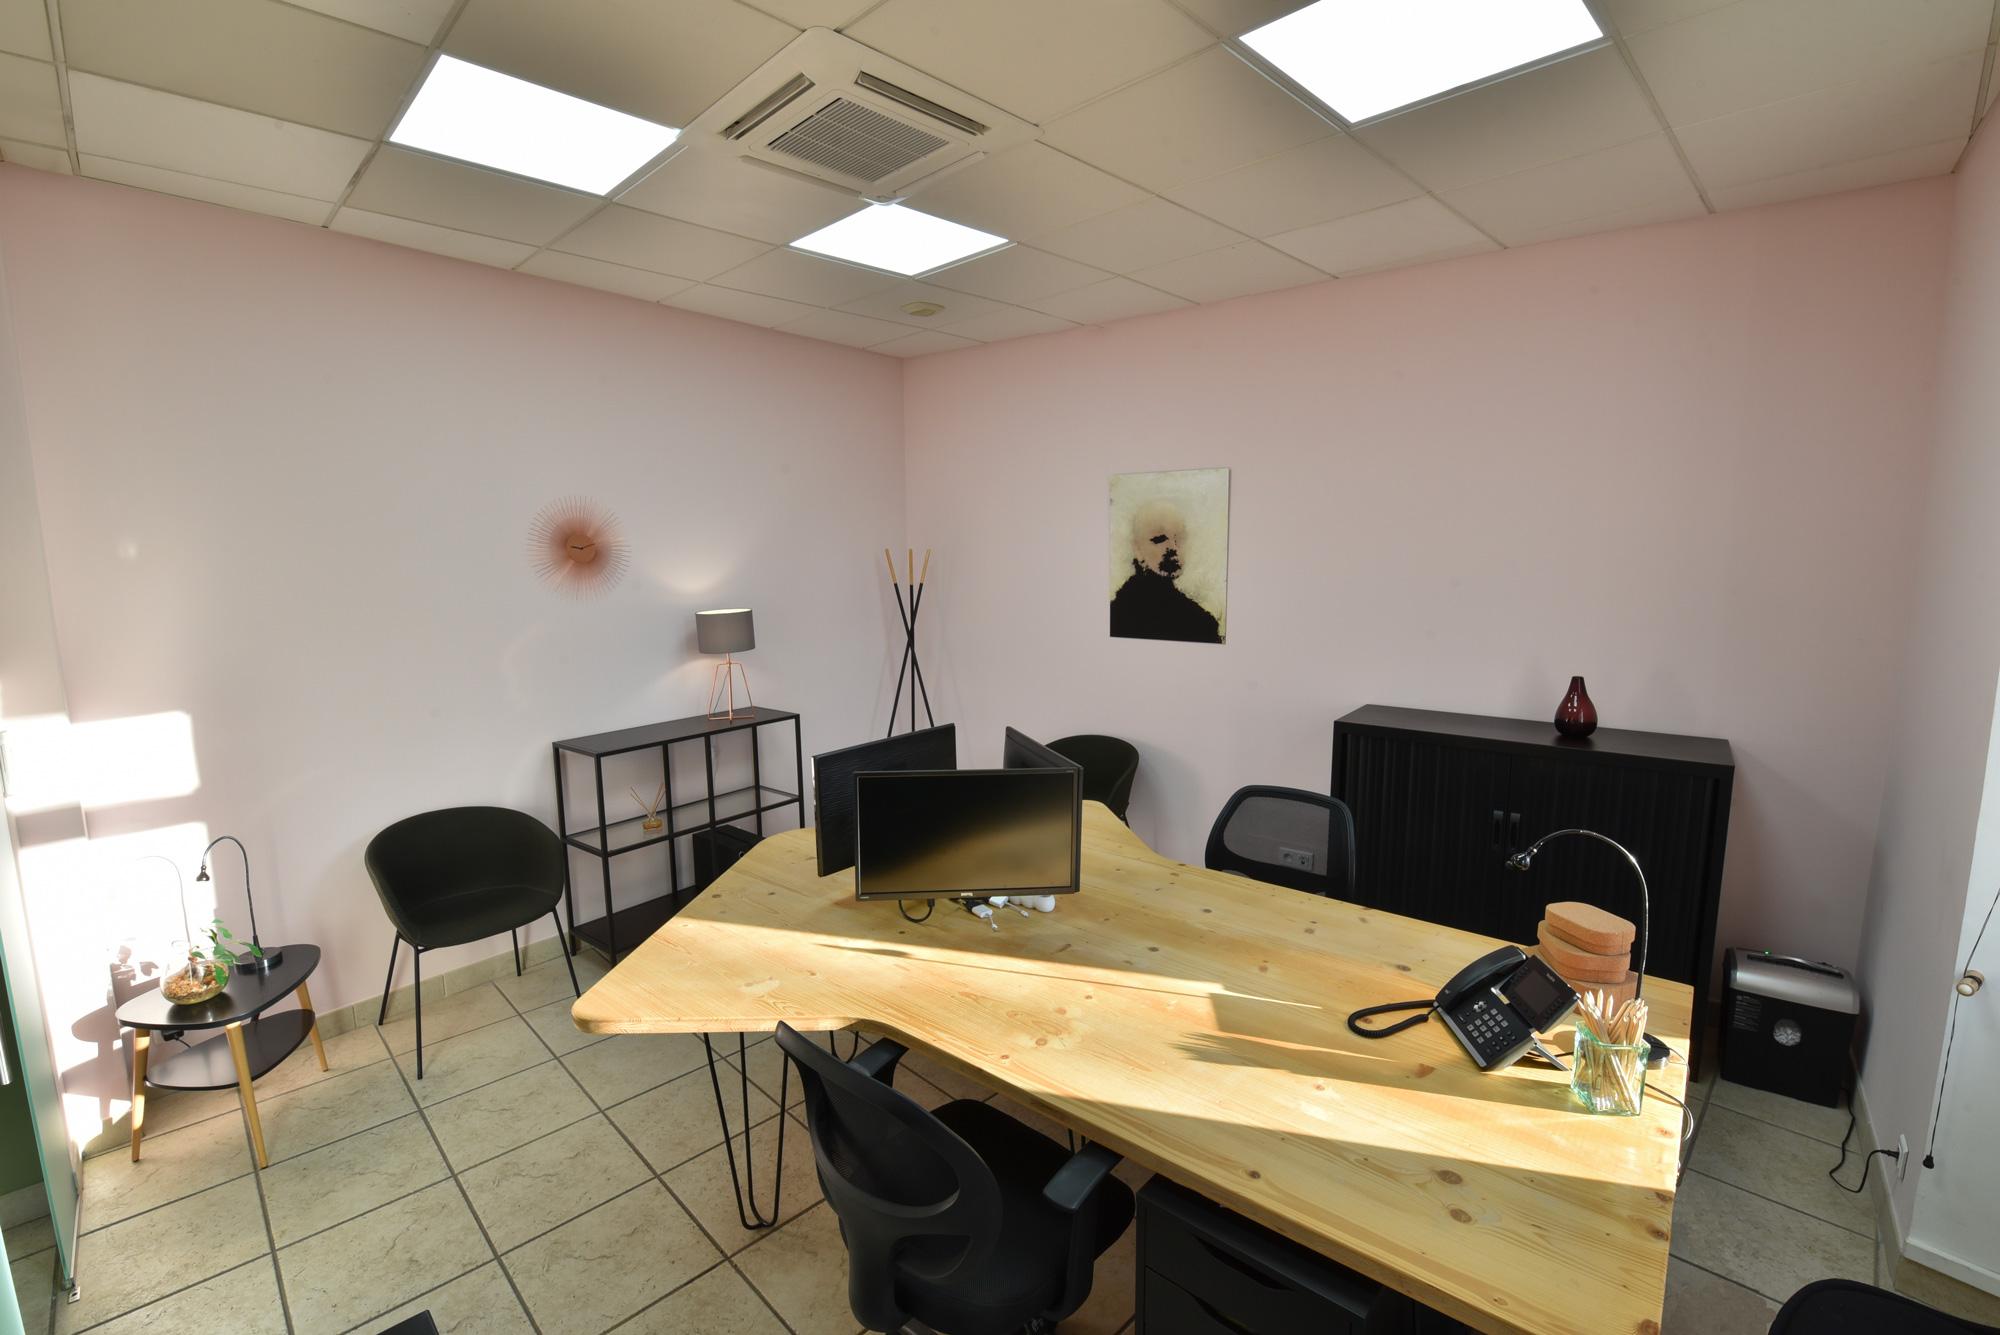 charles-working-rdc-salle-de-reunion-petite-000